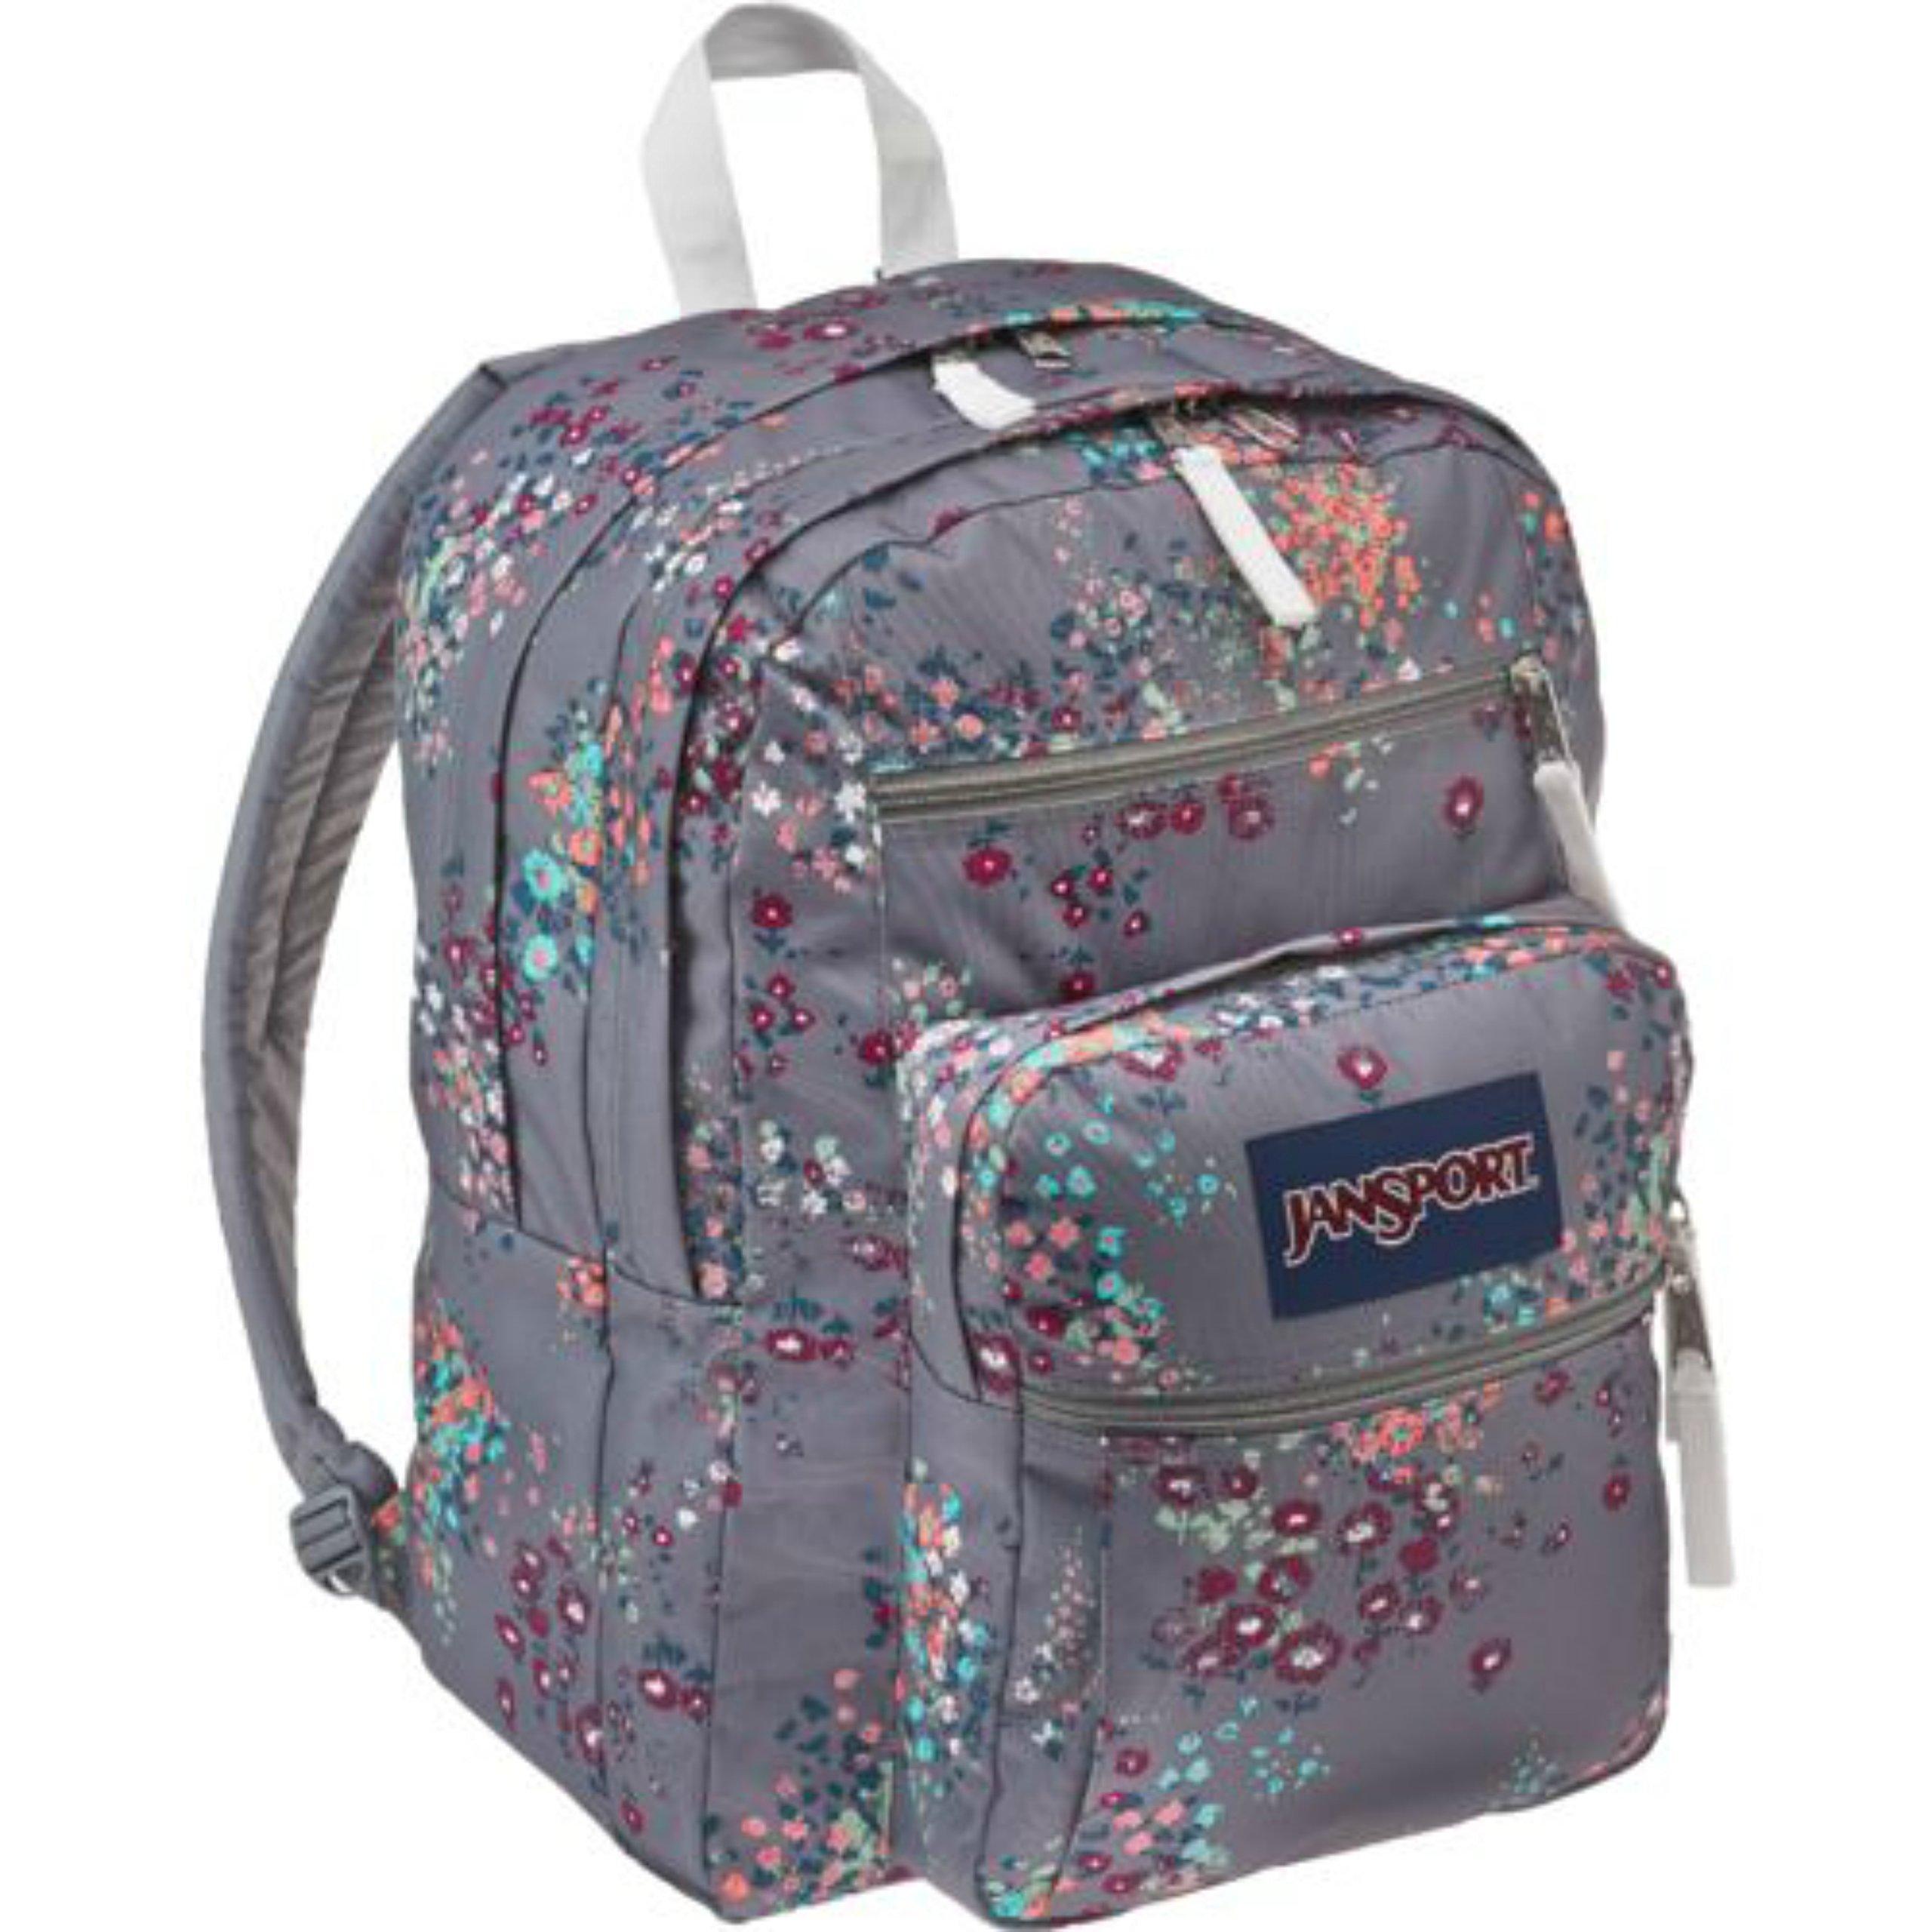 5125ba61f8 Get Quotations · JanSport Big Student Shady Grey Sprink Backpack